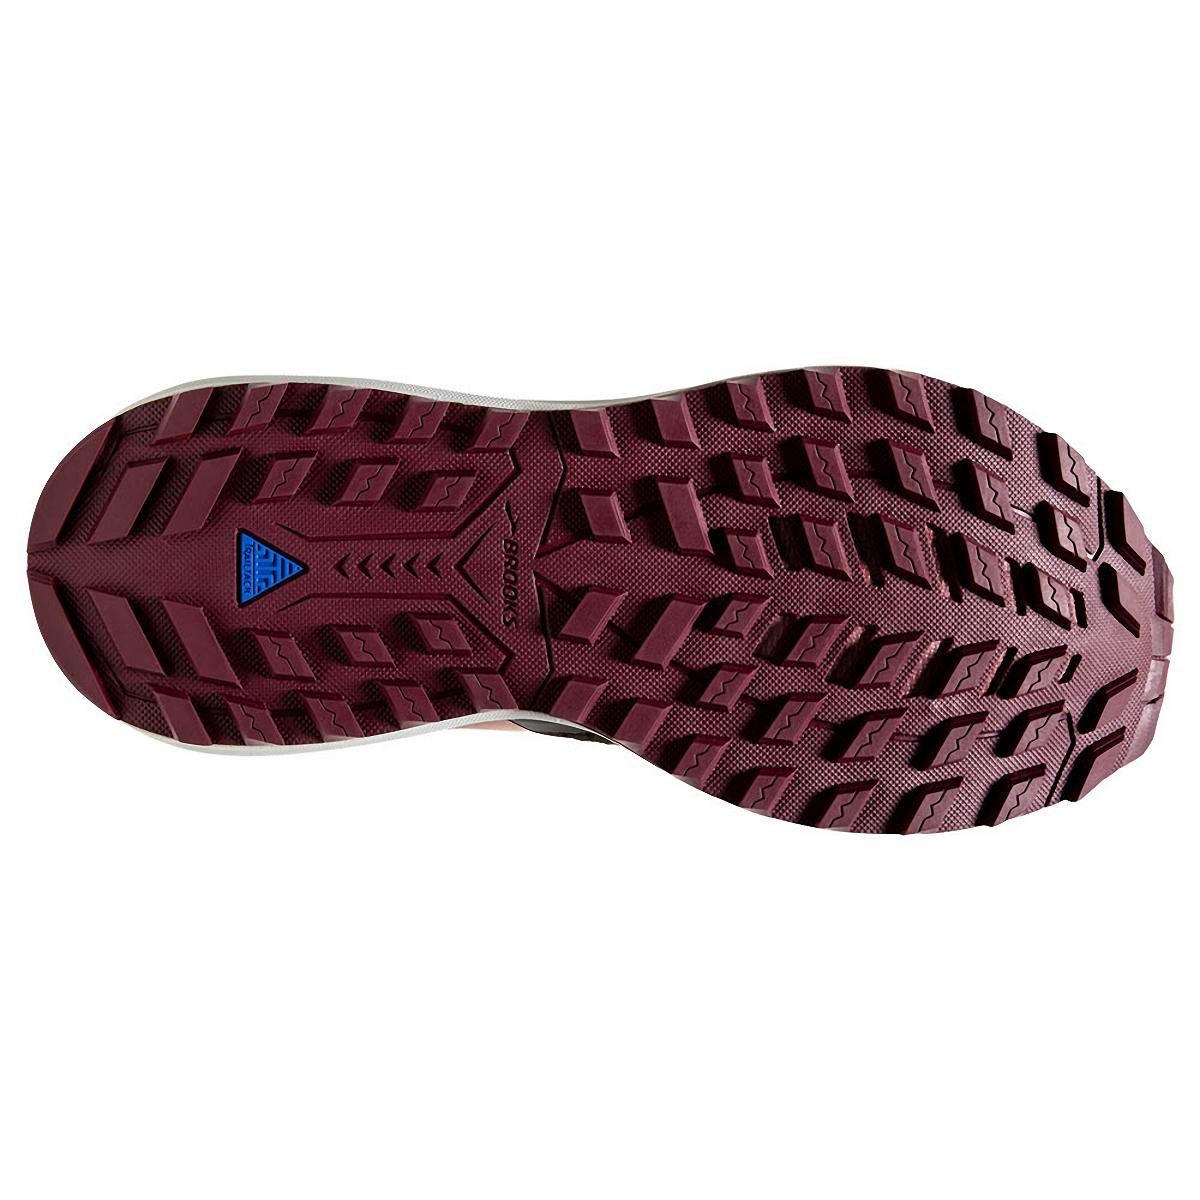 Women's Brooks Cascadia 15 Trail Running Shoe - Color: Black/Ebony/Coral - Size: 10.5 - Width: Regular, Black/Ebony/Coral, large, image 6